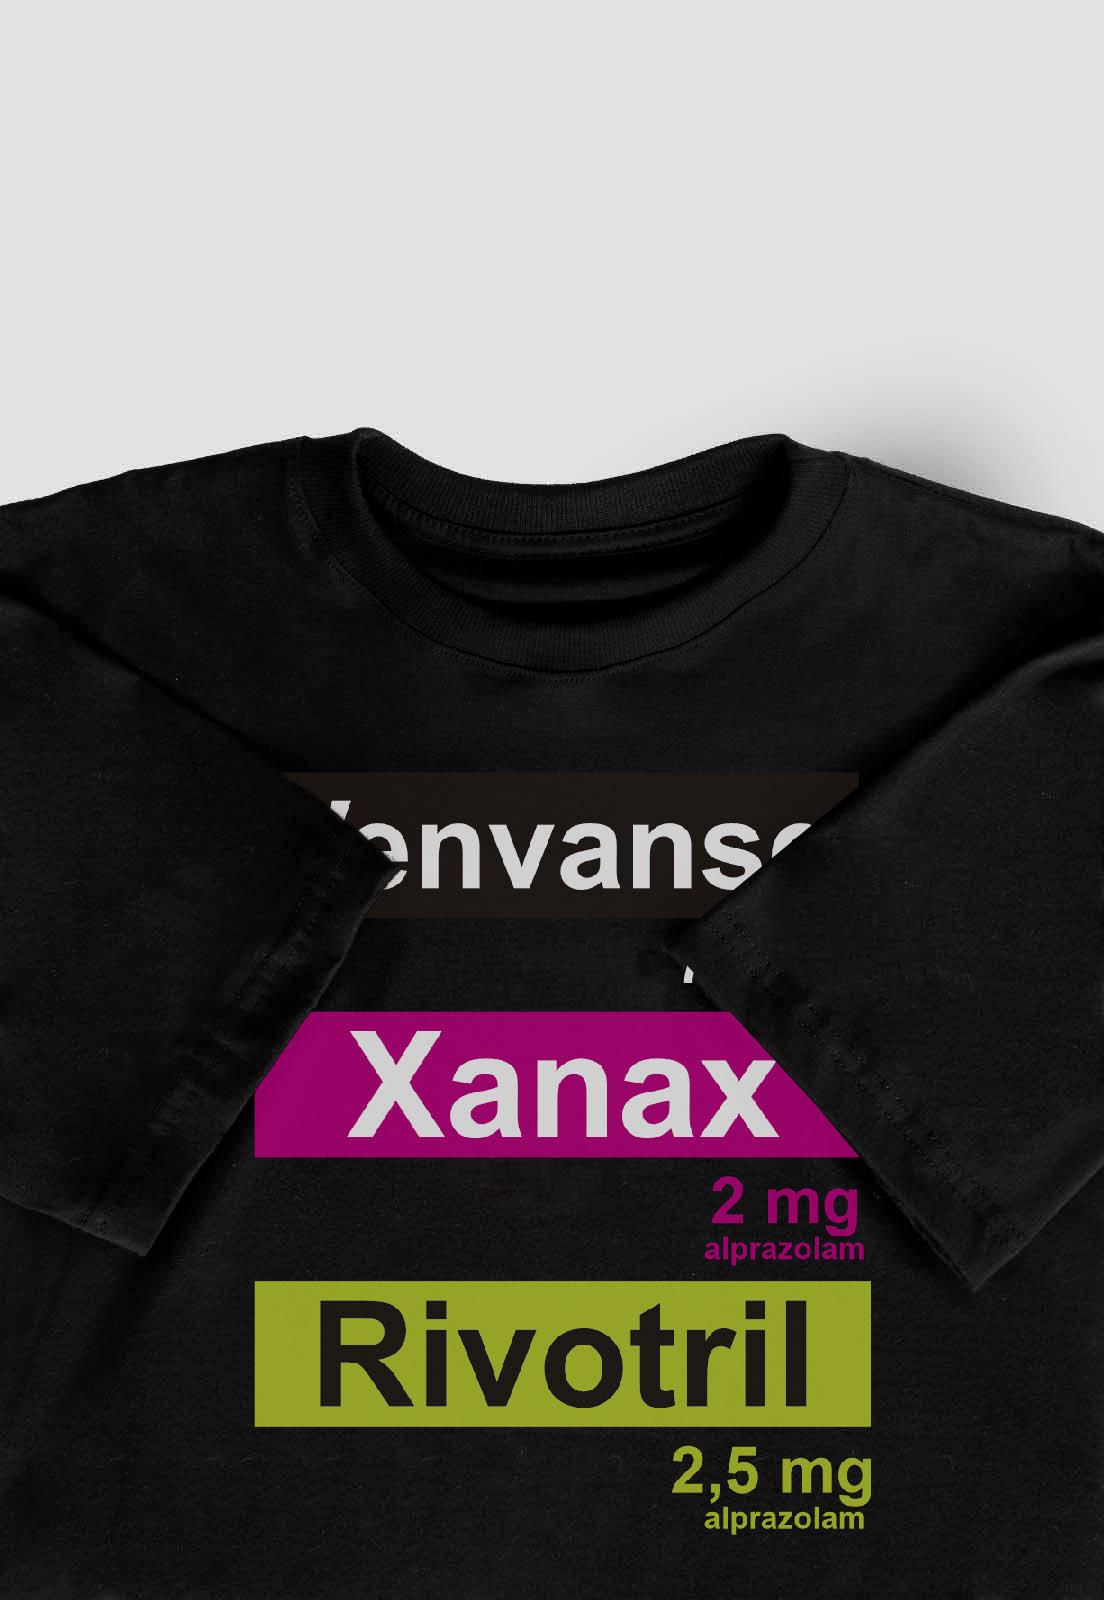 Camiseta Streetwear Prison medicines